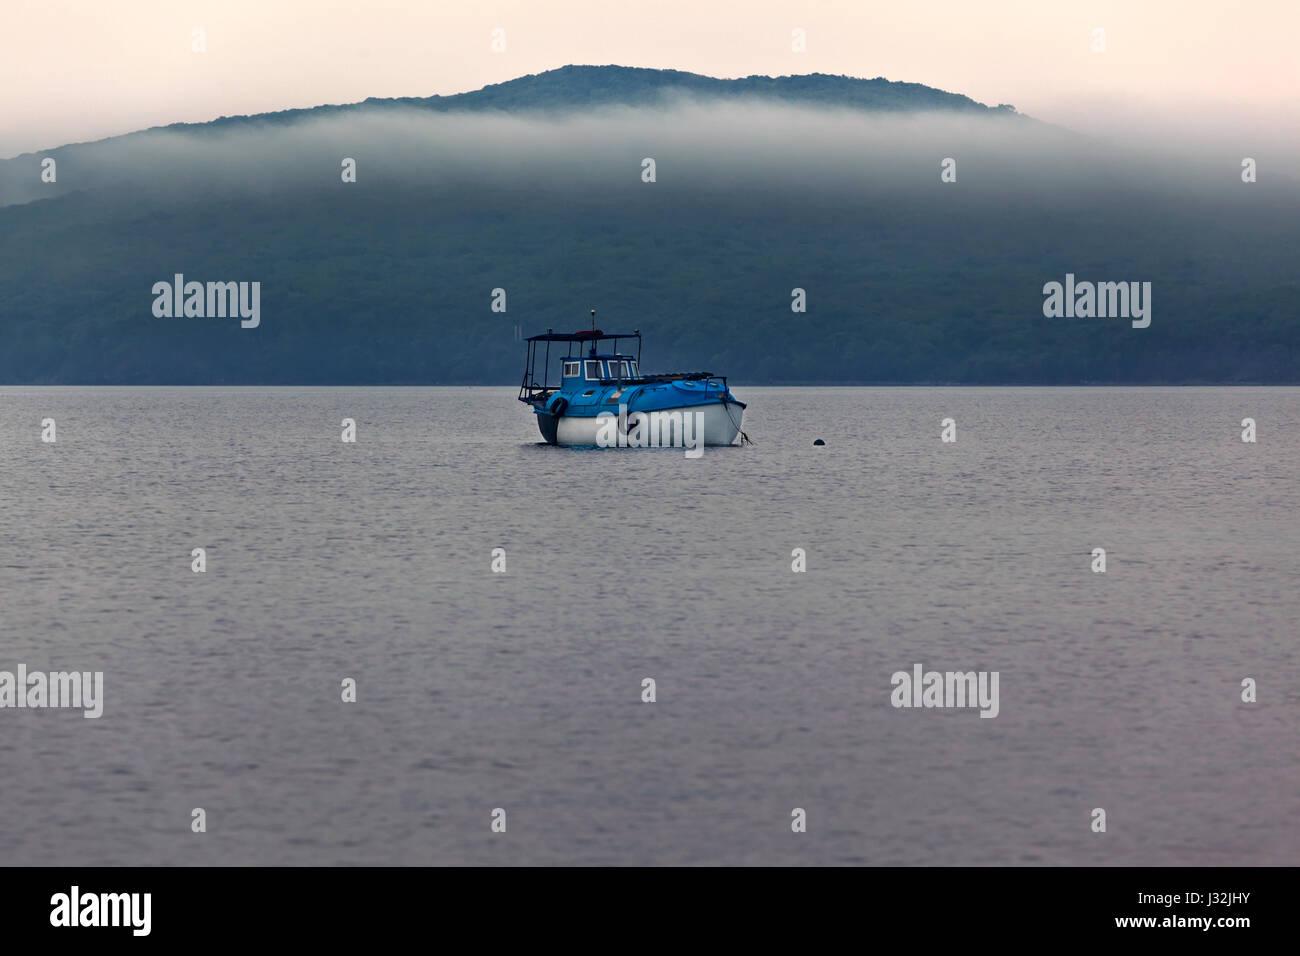 Anchored boat, sopka, misty morning, Vladivostok - Stock Image